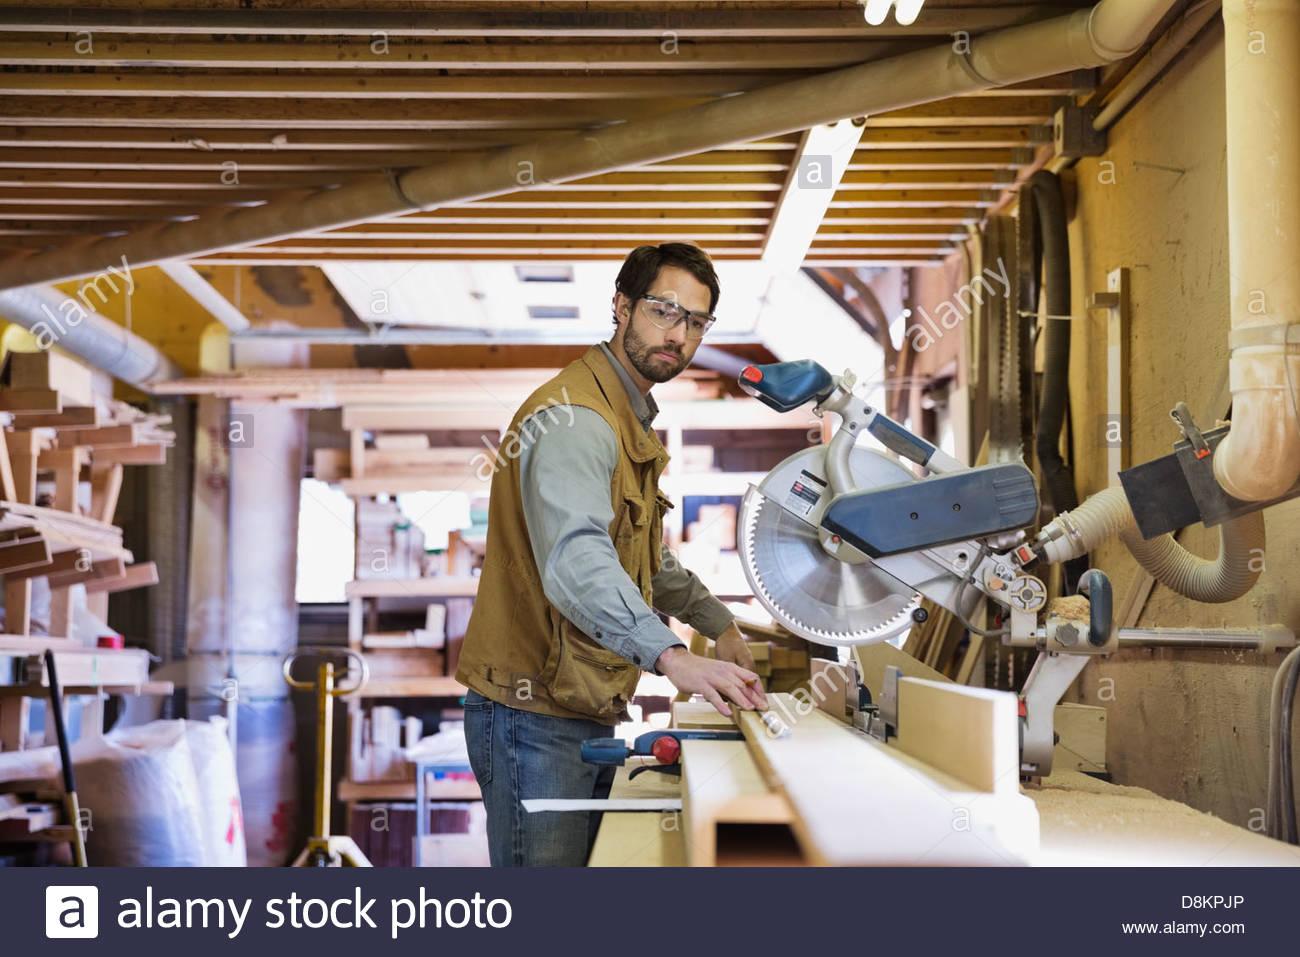 Woodworker measuring wood in workshop - Stock Image